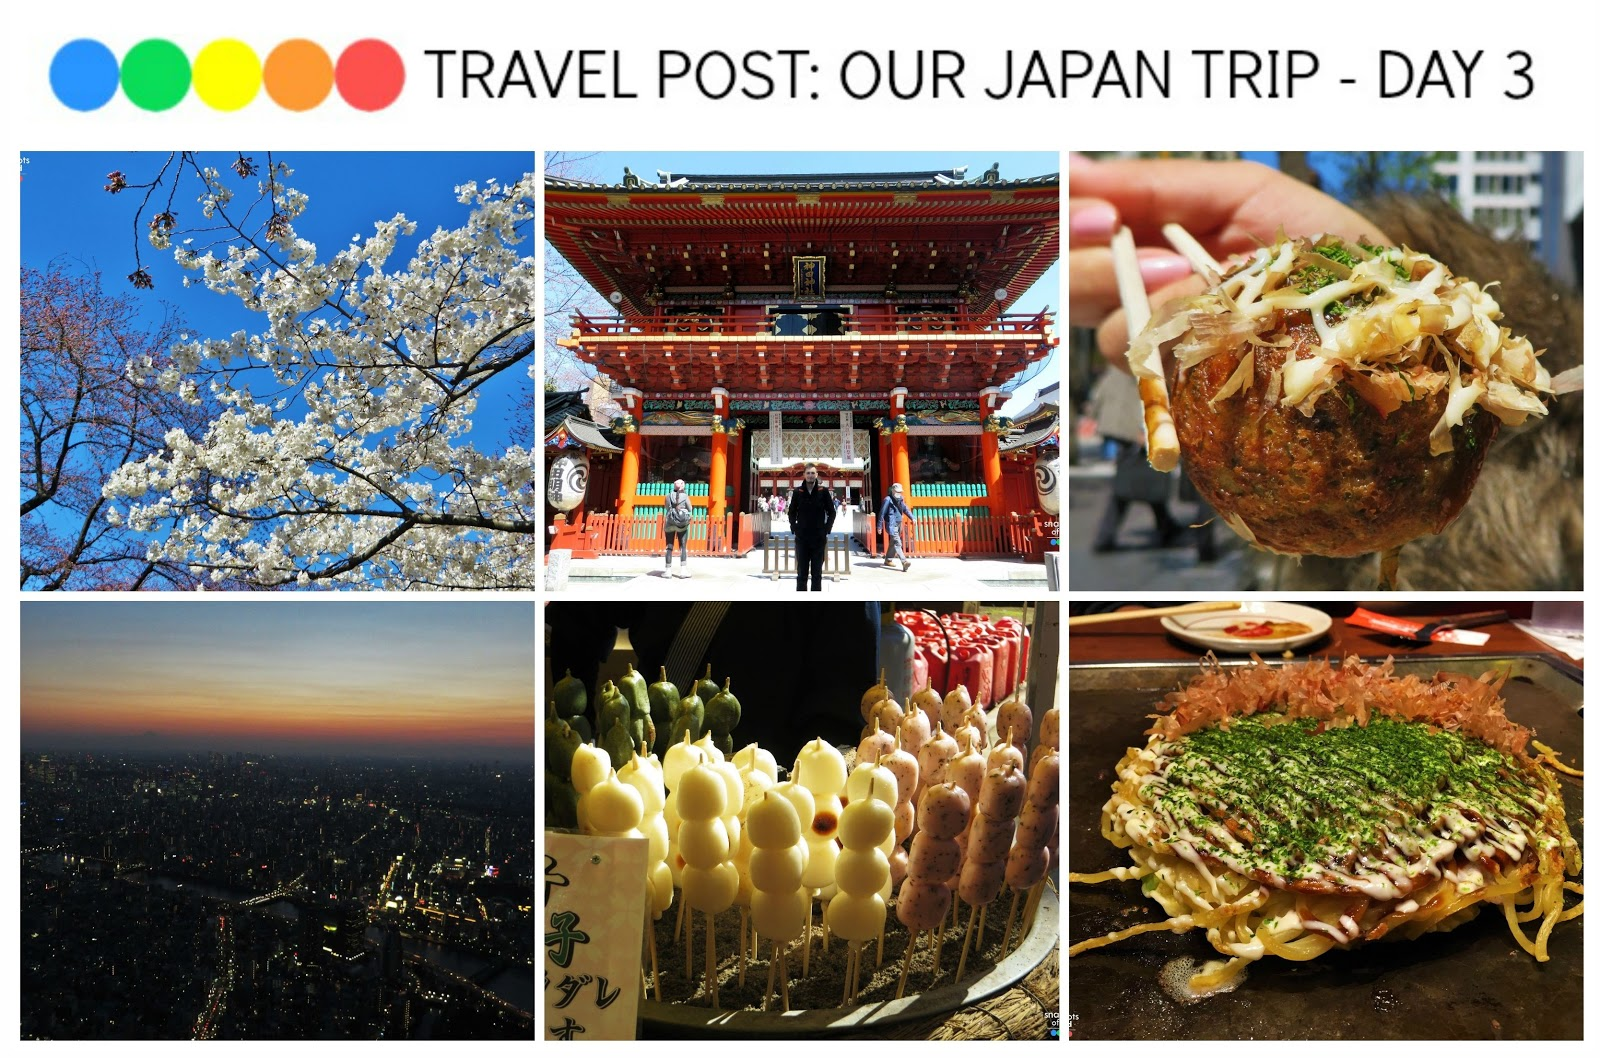 Travel post: Our Japan Trip - Day 3 (Myojin Shrine, Anime Centre, Akihabara, Gindaco Takoyaki, Ueno Park, Ueno Park Food Stalls, Ameyokocho, Sumida Skytree and Restaurant Okonomiyaki Yukari)